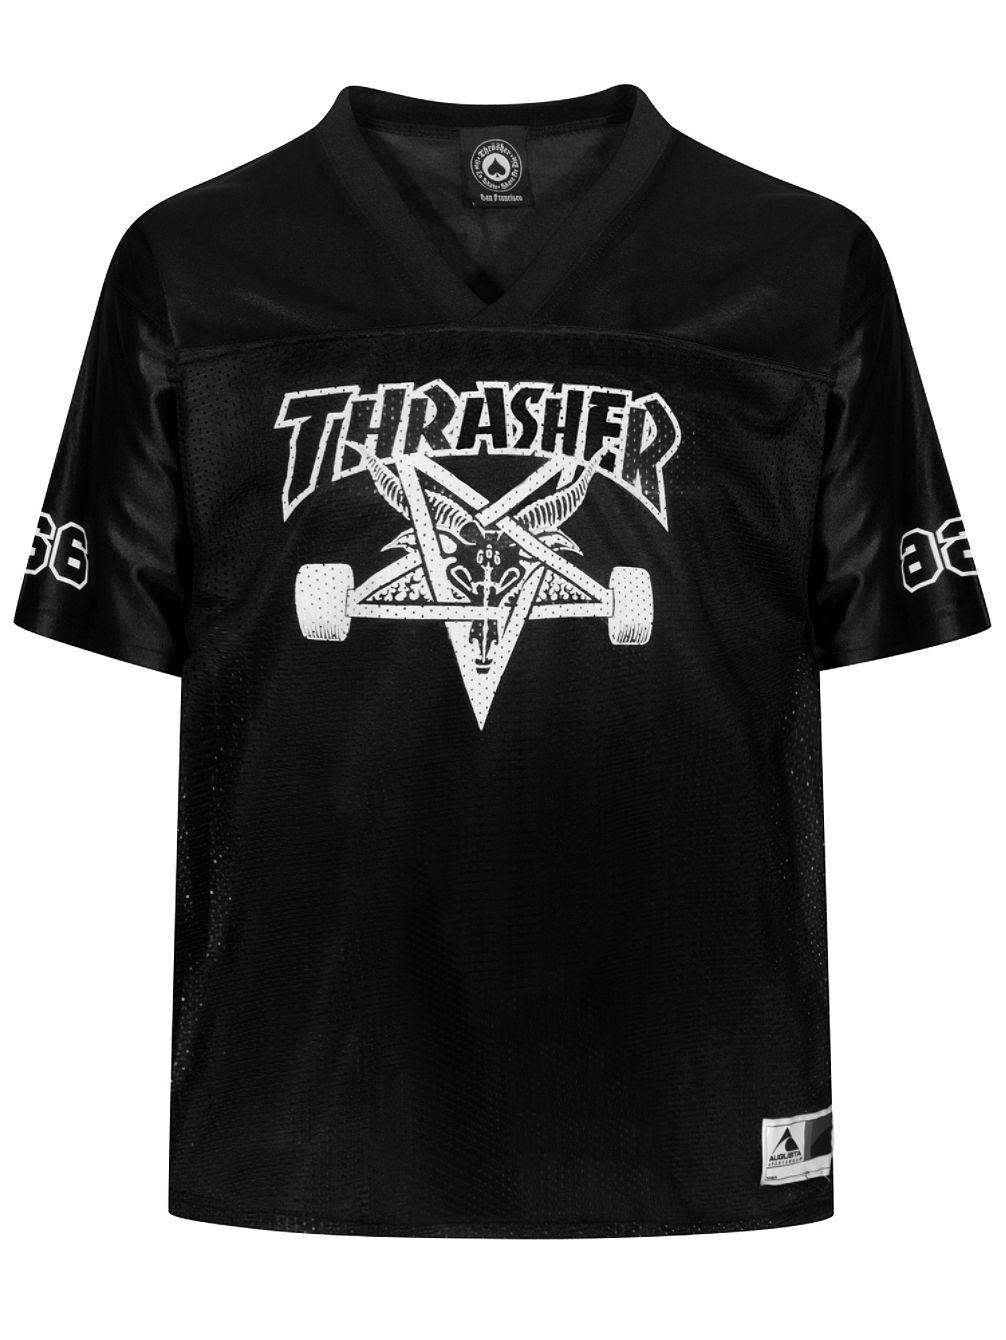 39dab948d89 Buy Thrasher Skate Goat Jersey T-Shirt online at Blue Tomato